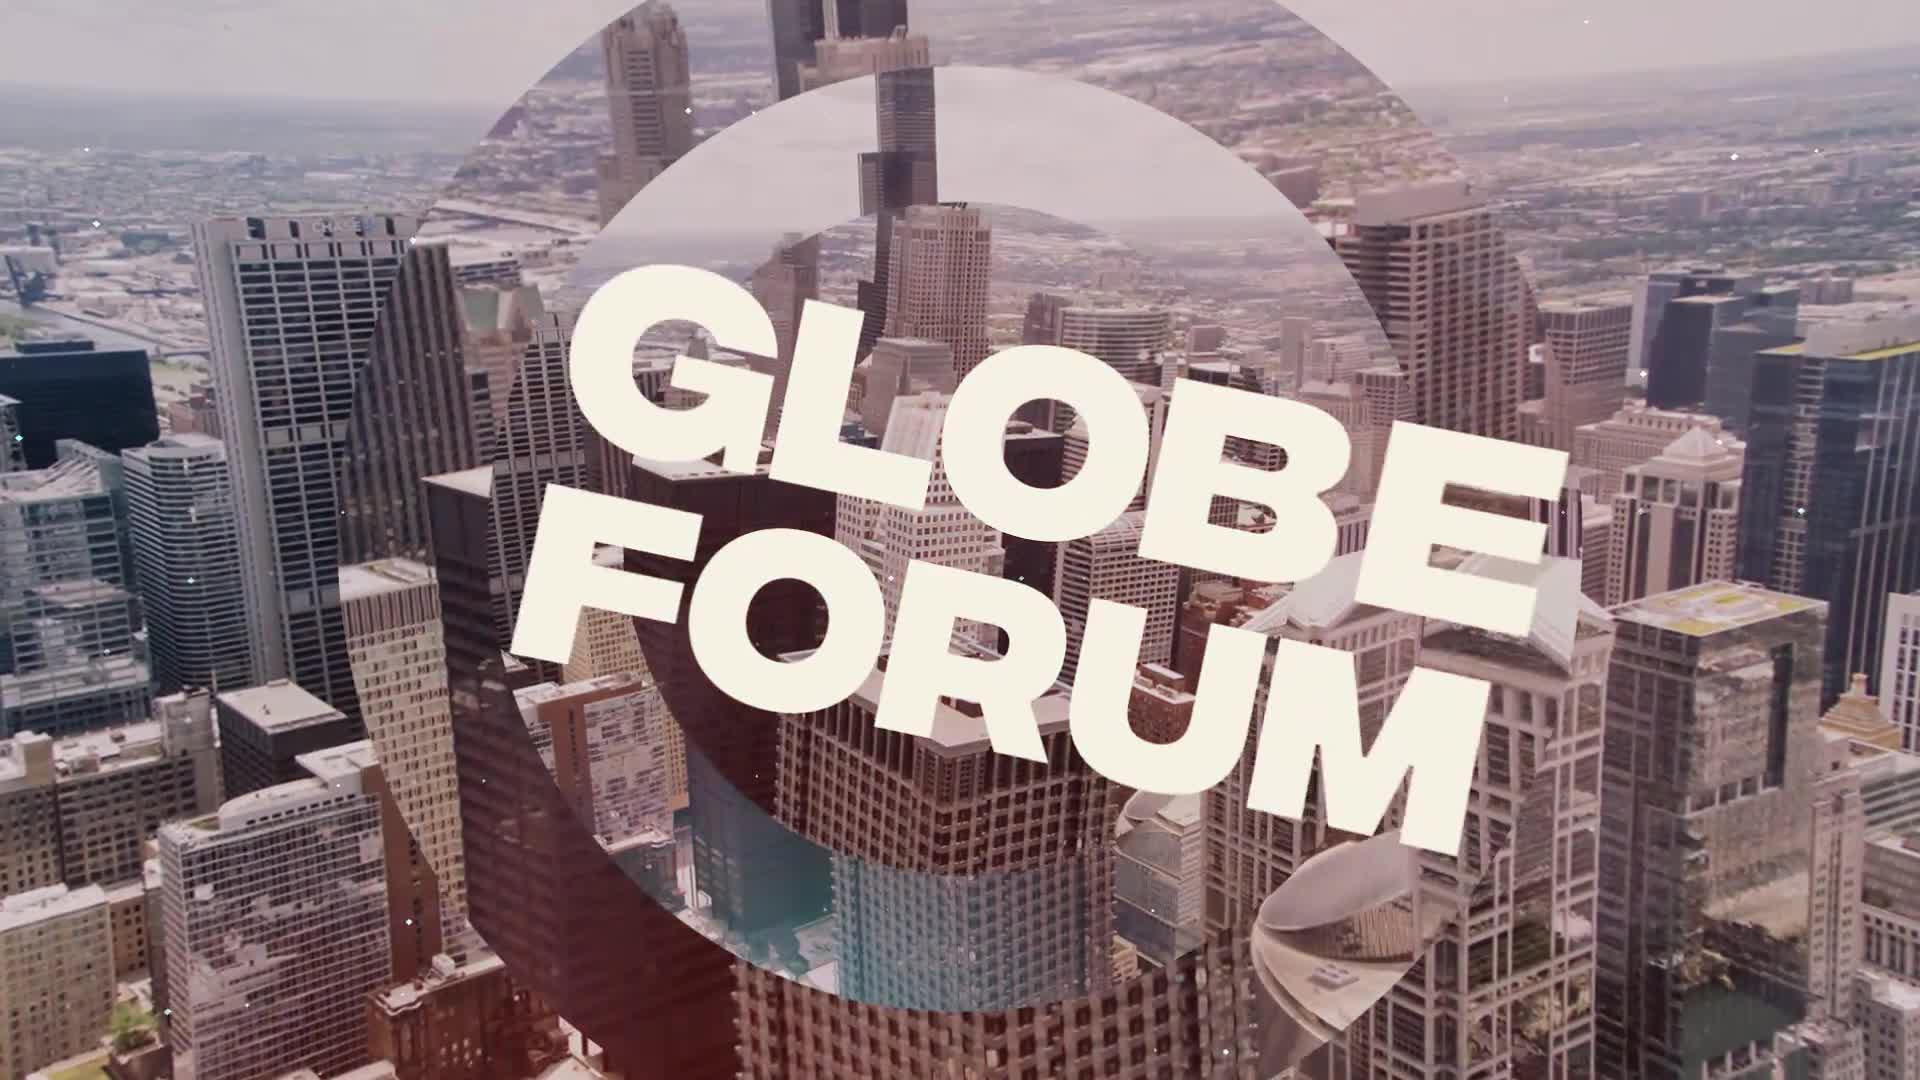 Globetrotter Forum